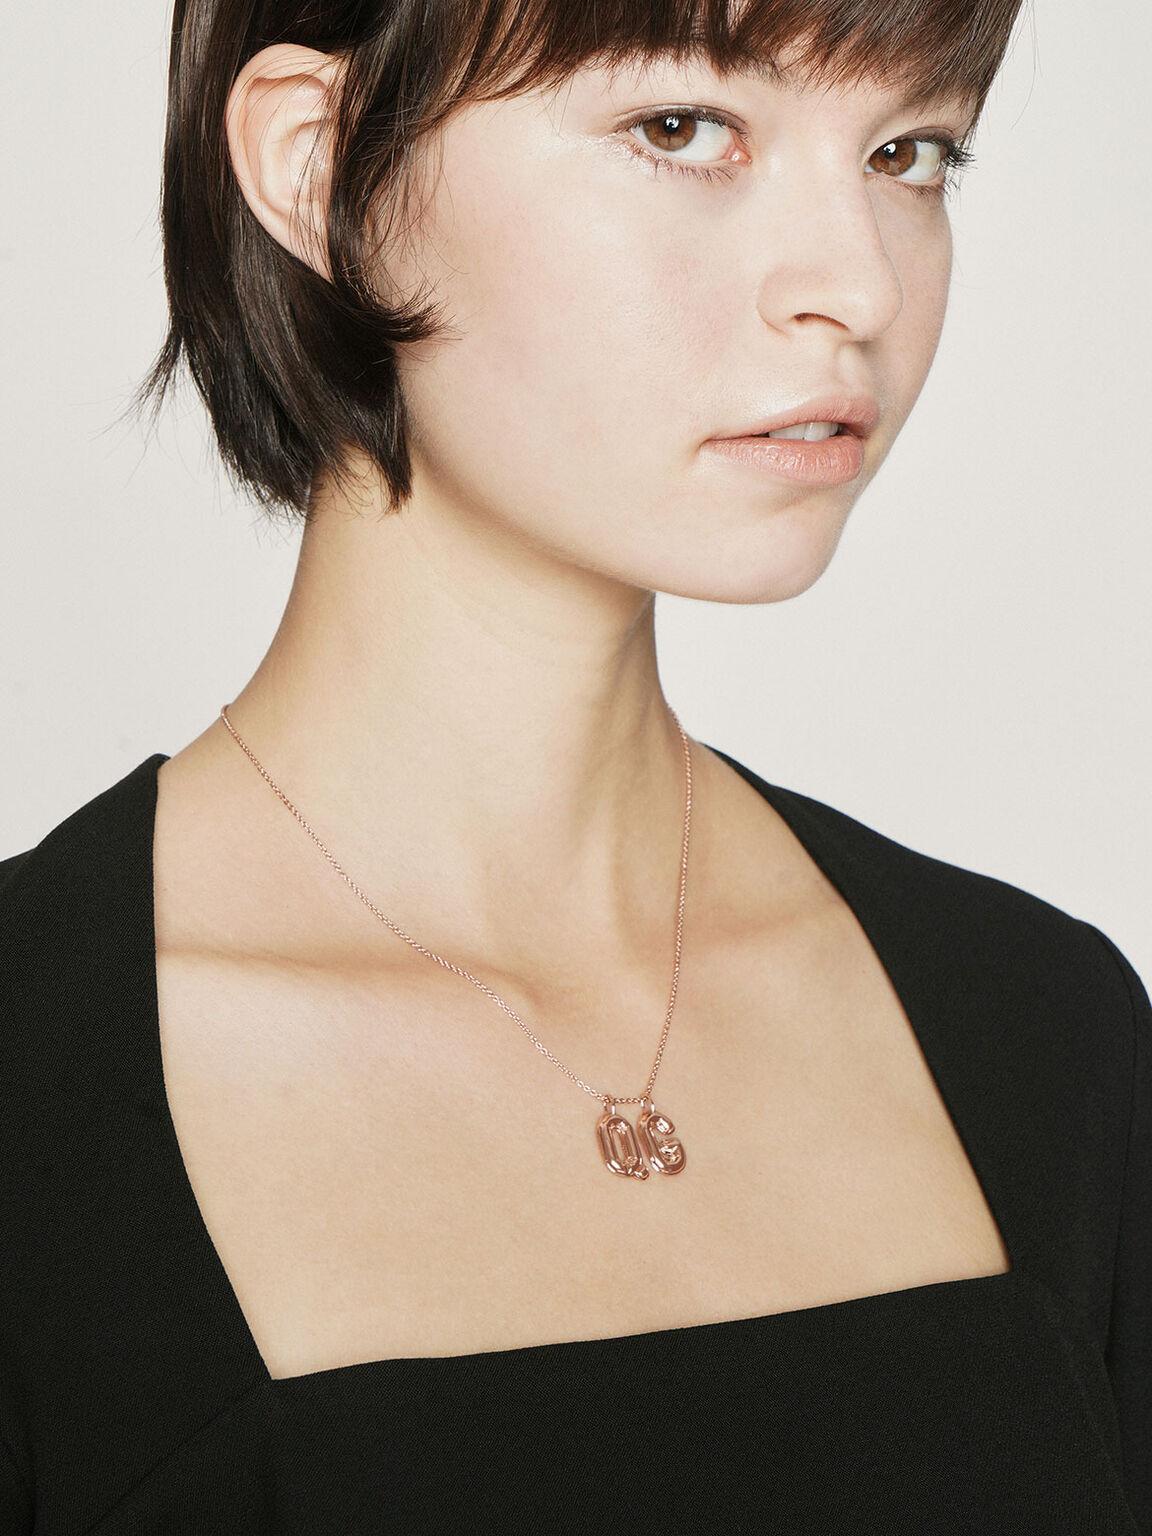 Princess Chain Necklace, Rose Gold, hi-res